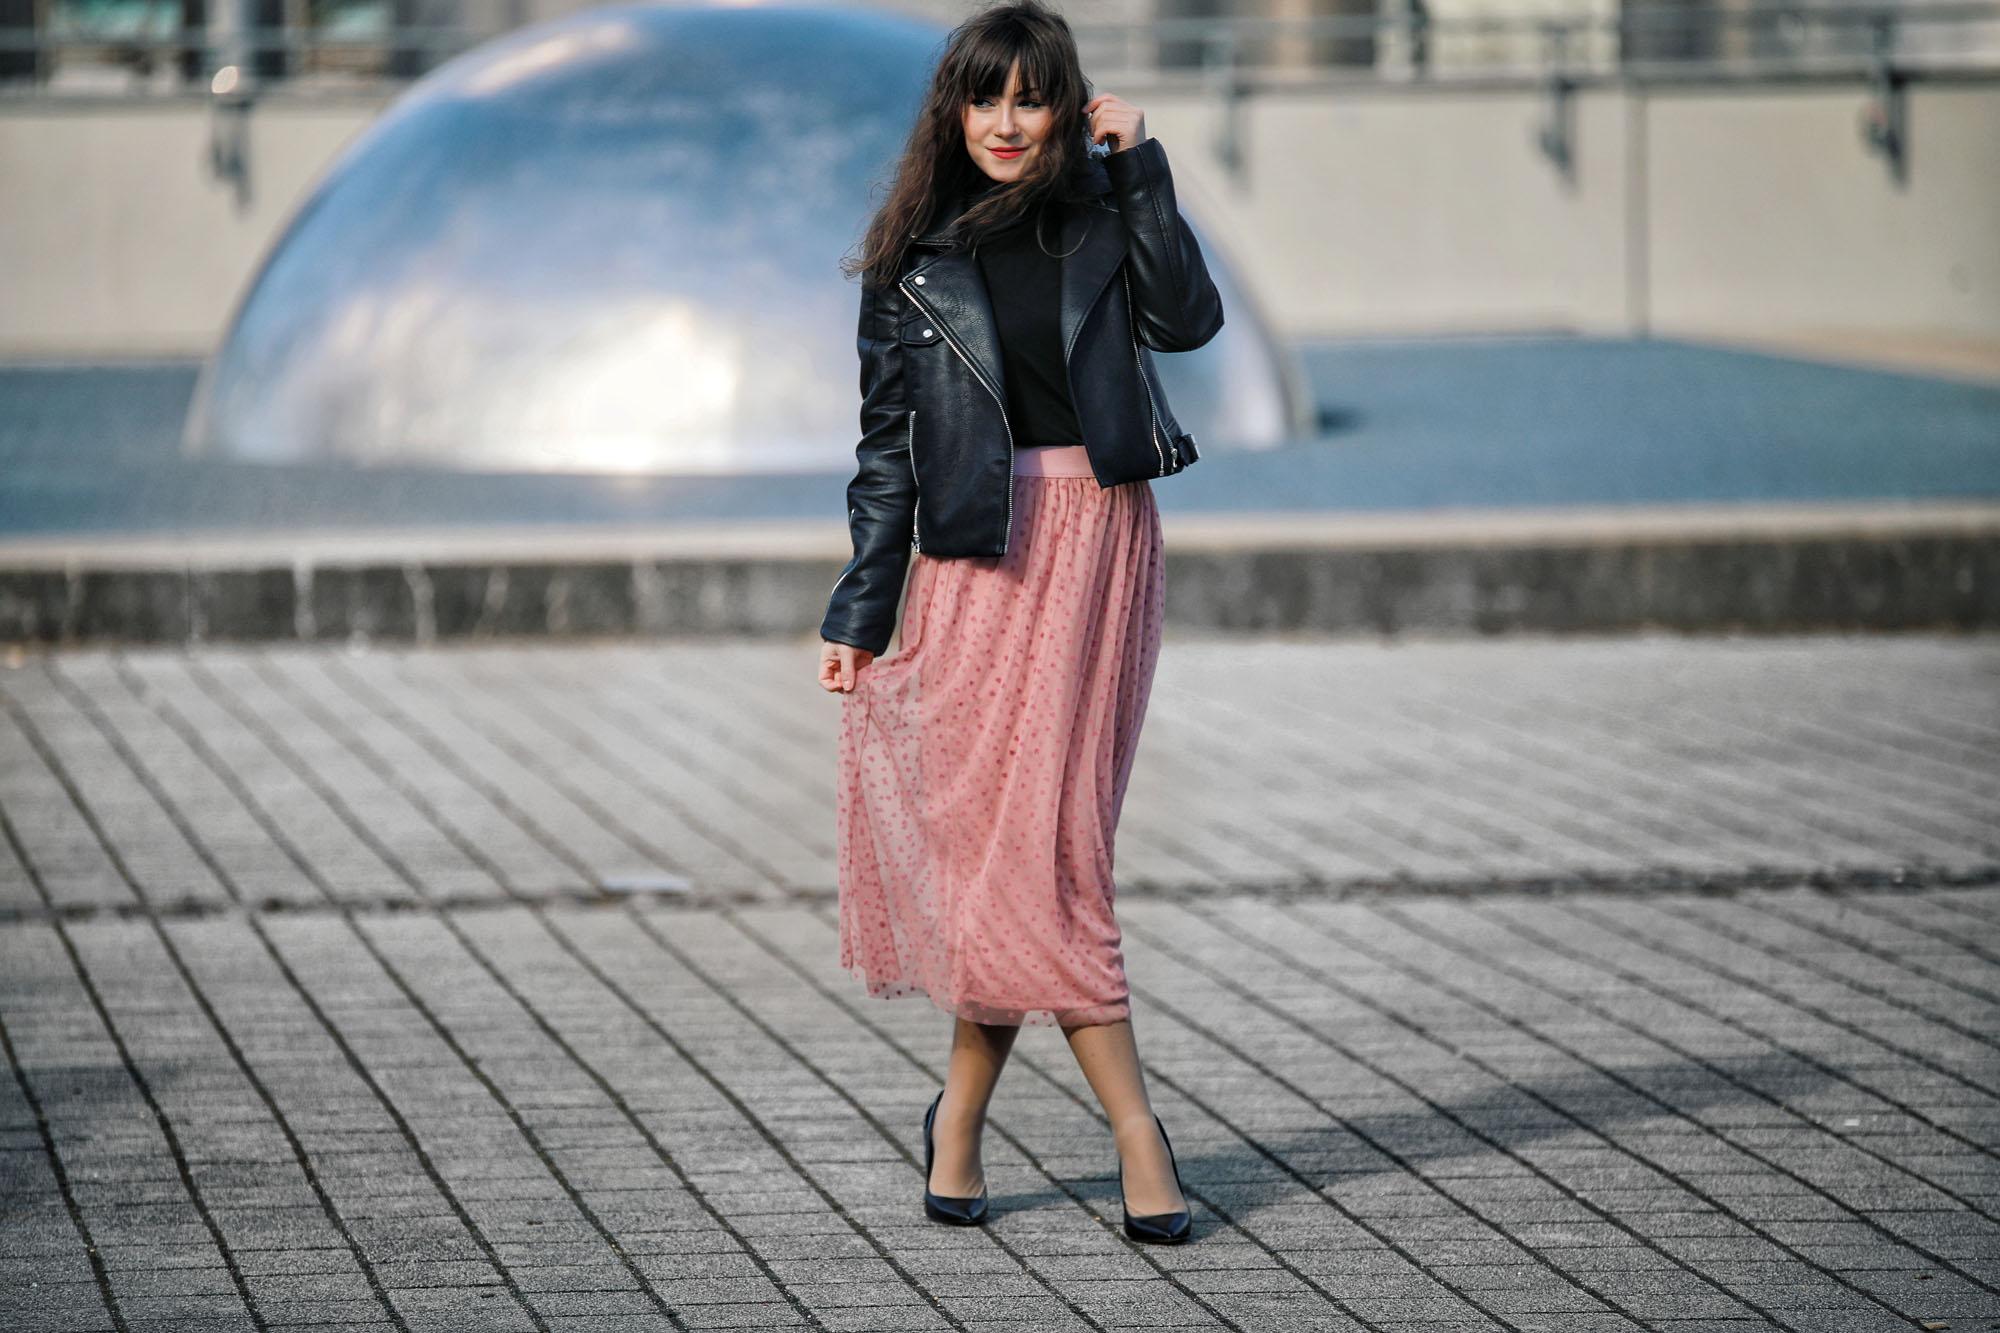 Tüllrock-kombinieren-Frühling/Sommer Trend-2018-Modeblog-Style by An